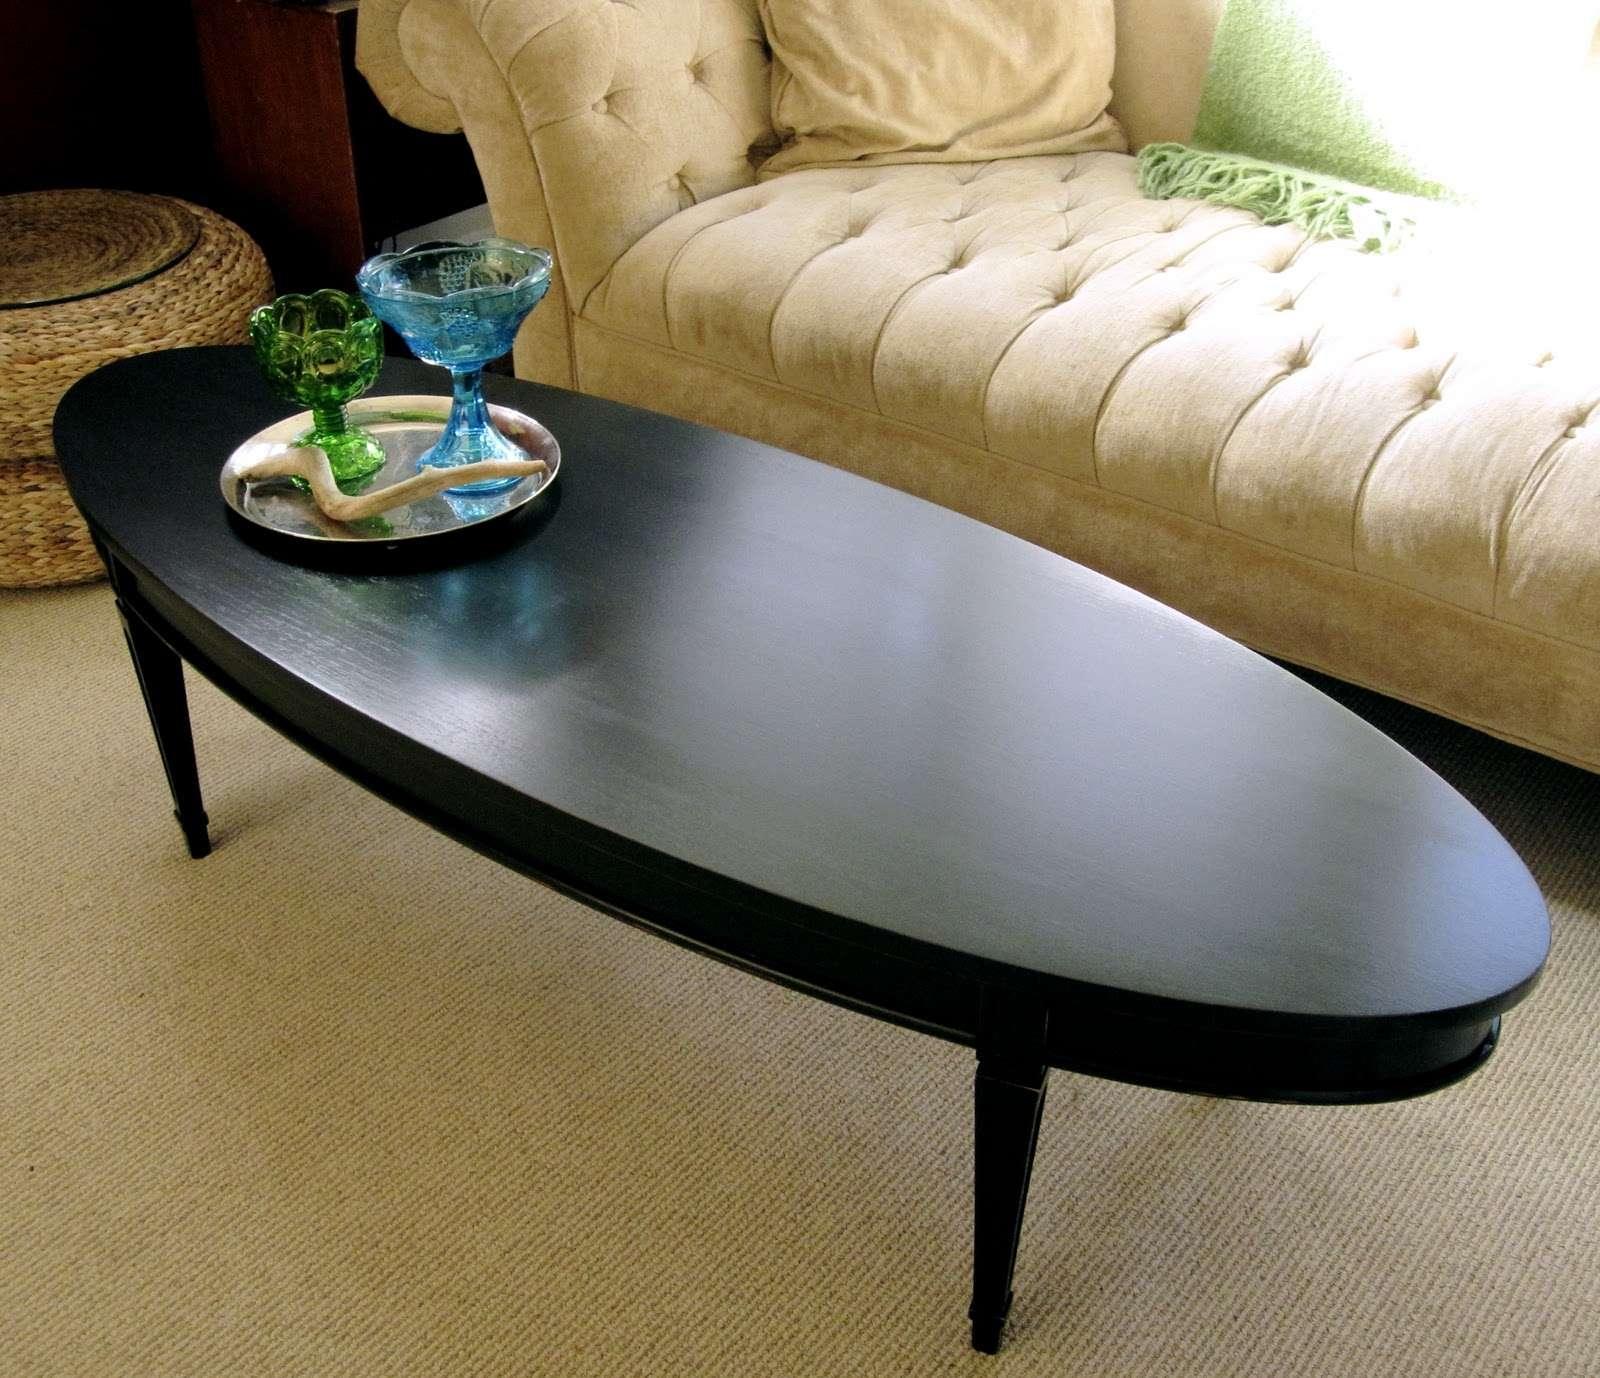 Sweet Tree Furniture: Black Oval Coffee Table Throughout Recent Black Oval Coffee Table (View 19 of 20)